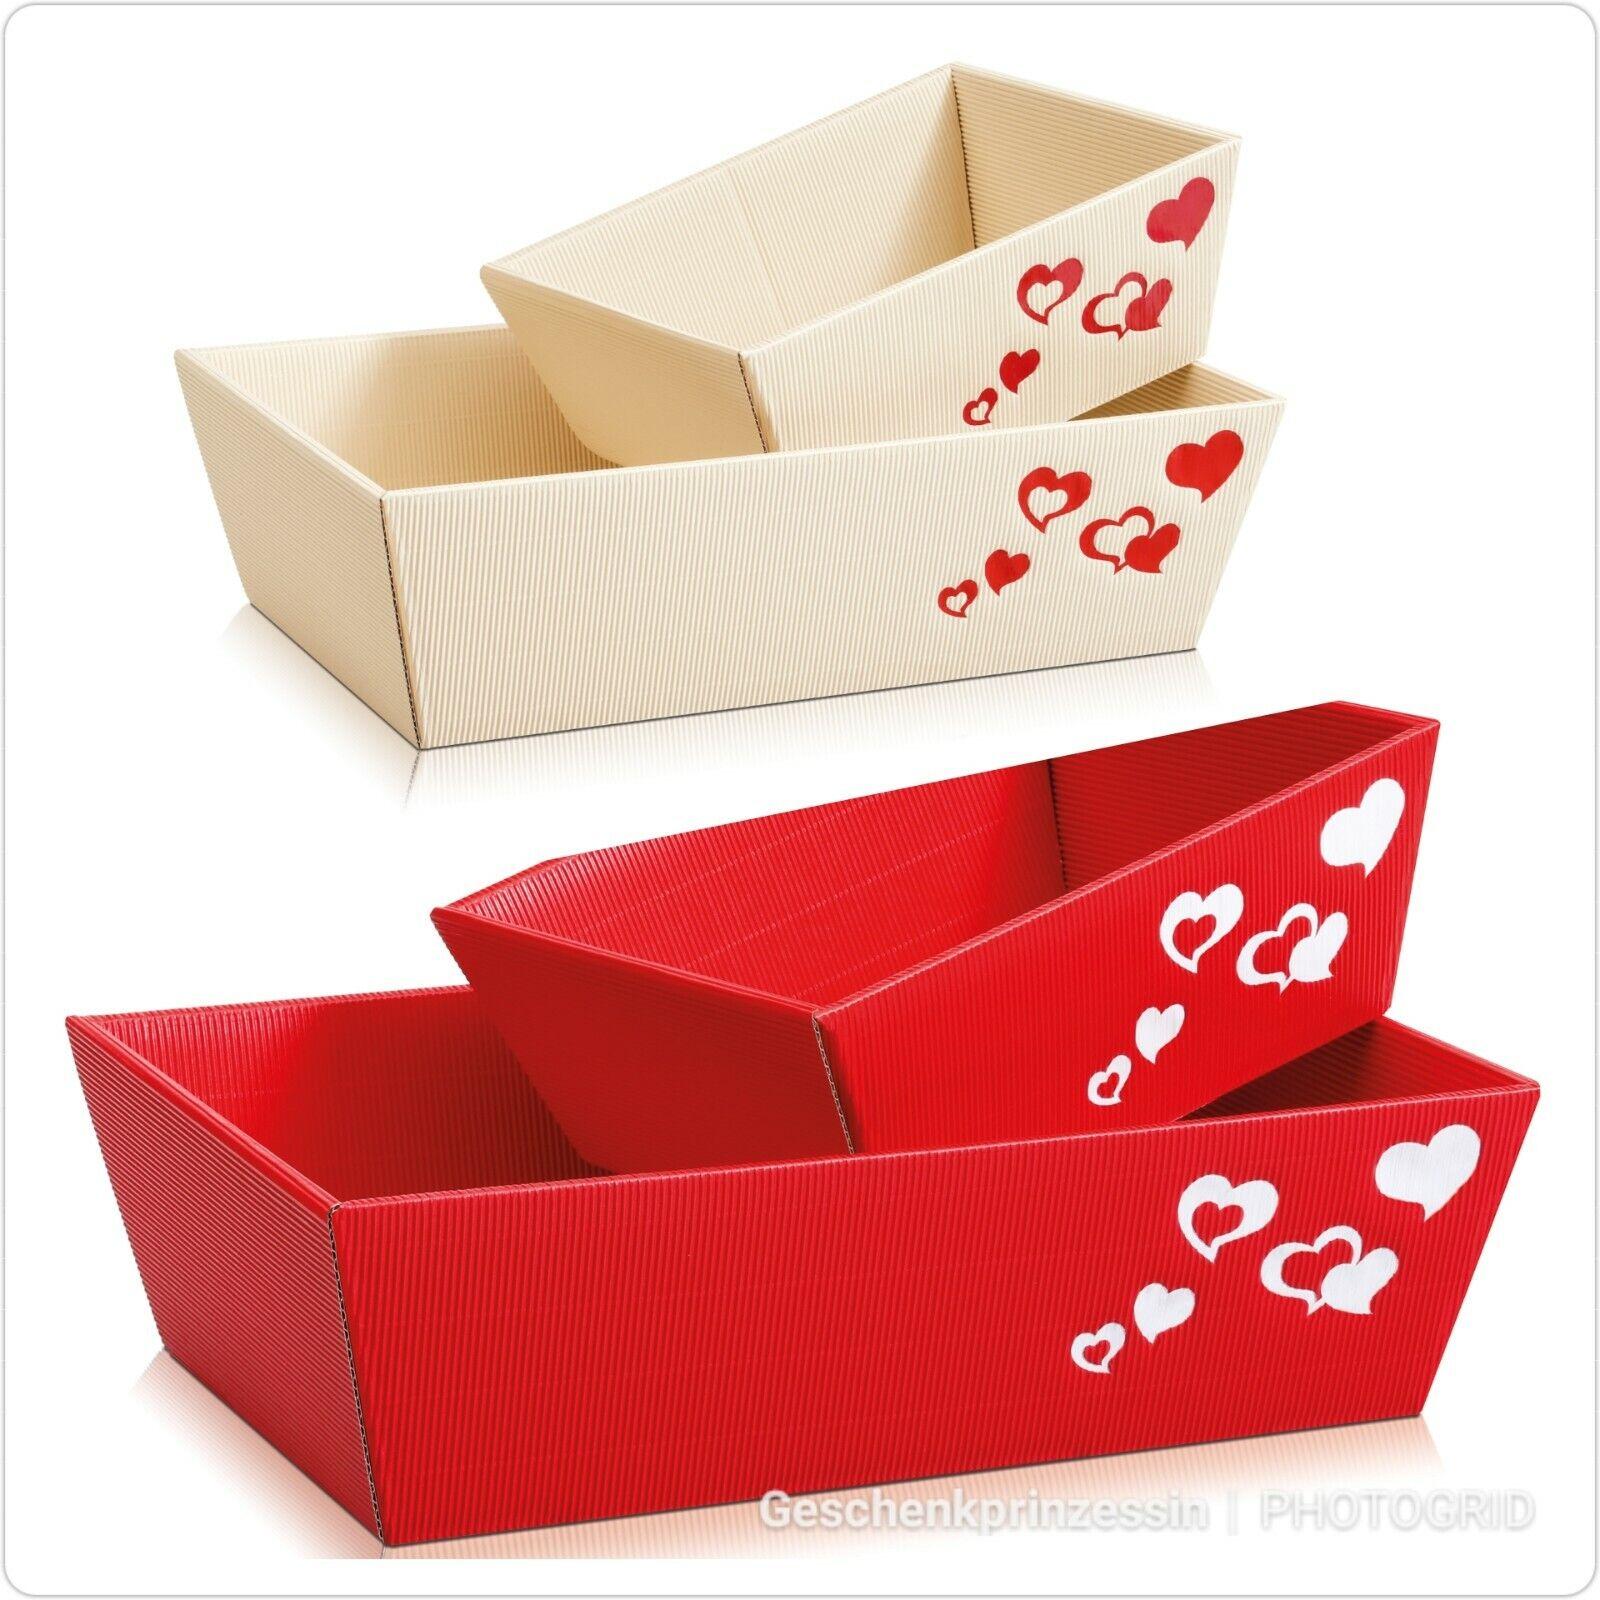 Präsentkorb leer Hochzeit Geschenkkorb Herzen Herz Geschenk weiß rot